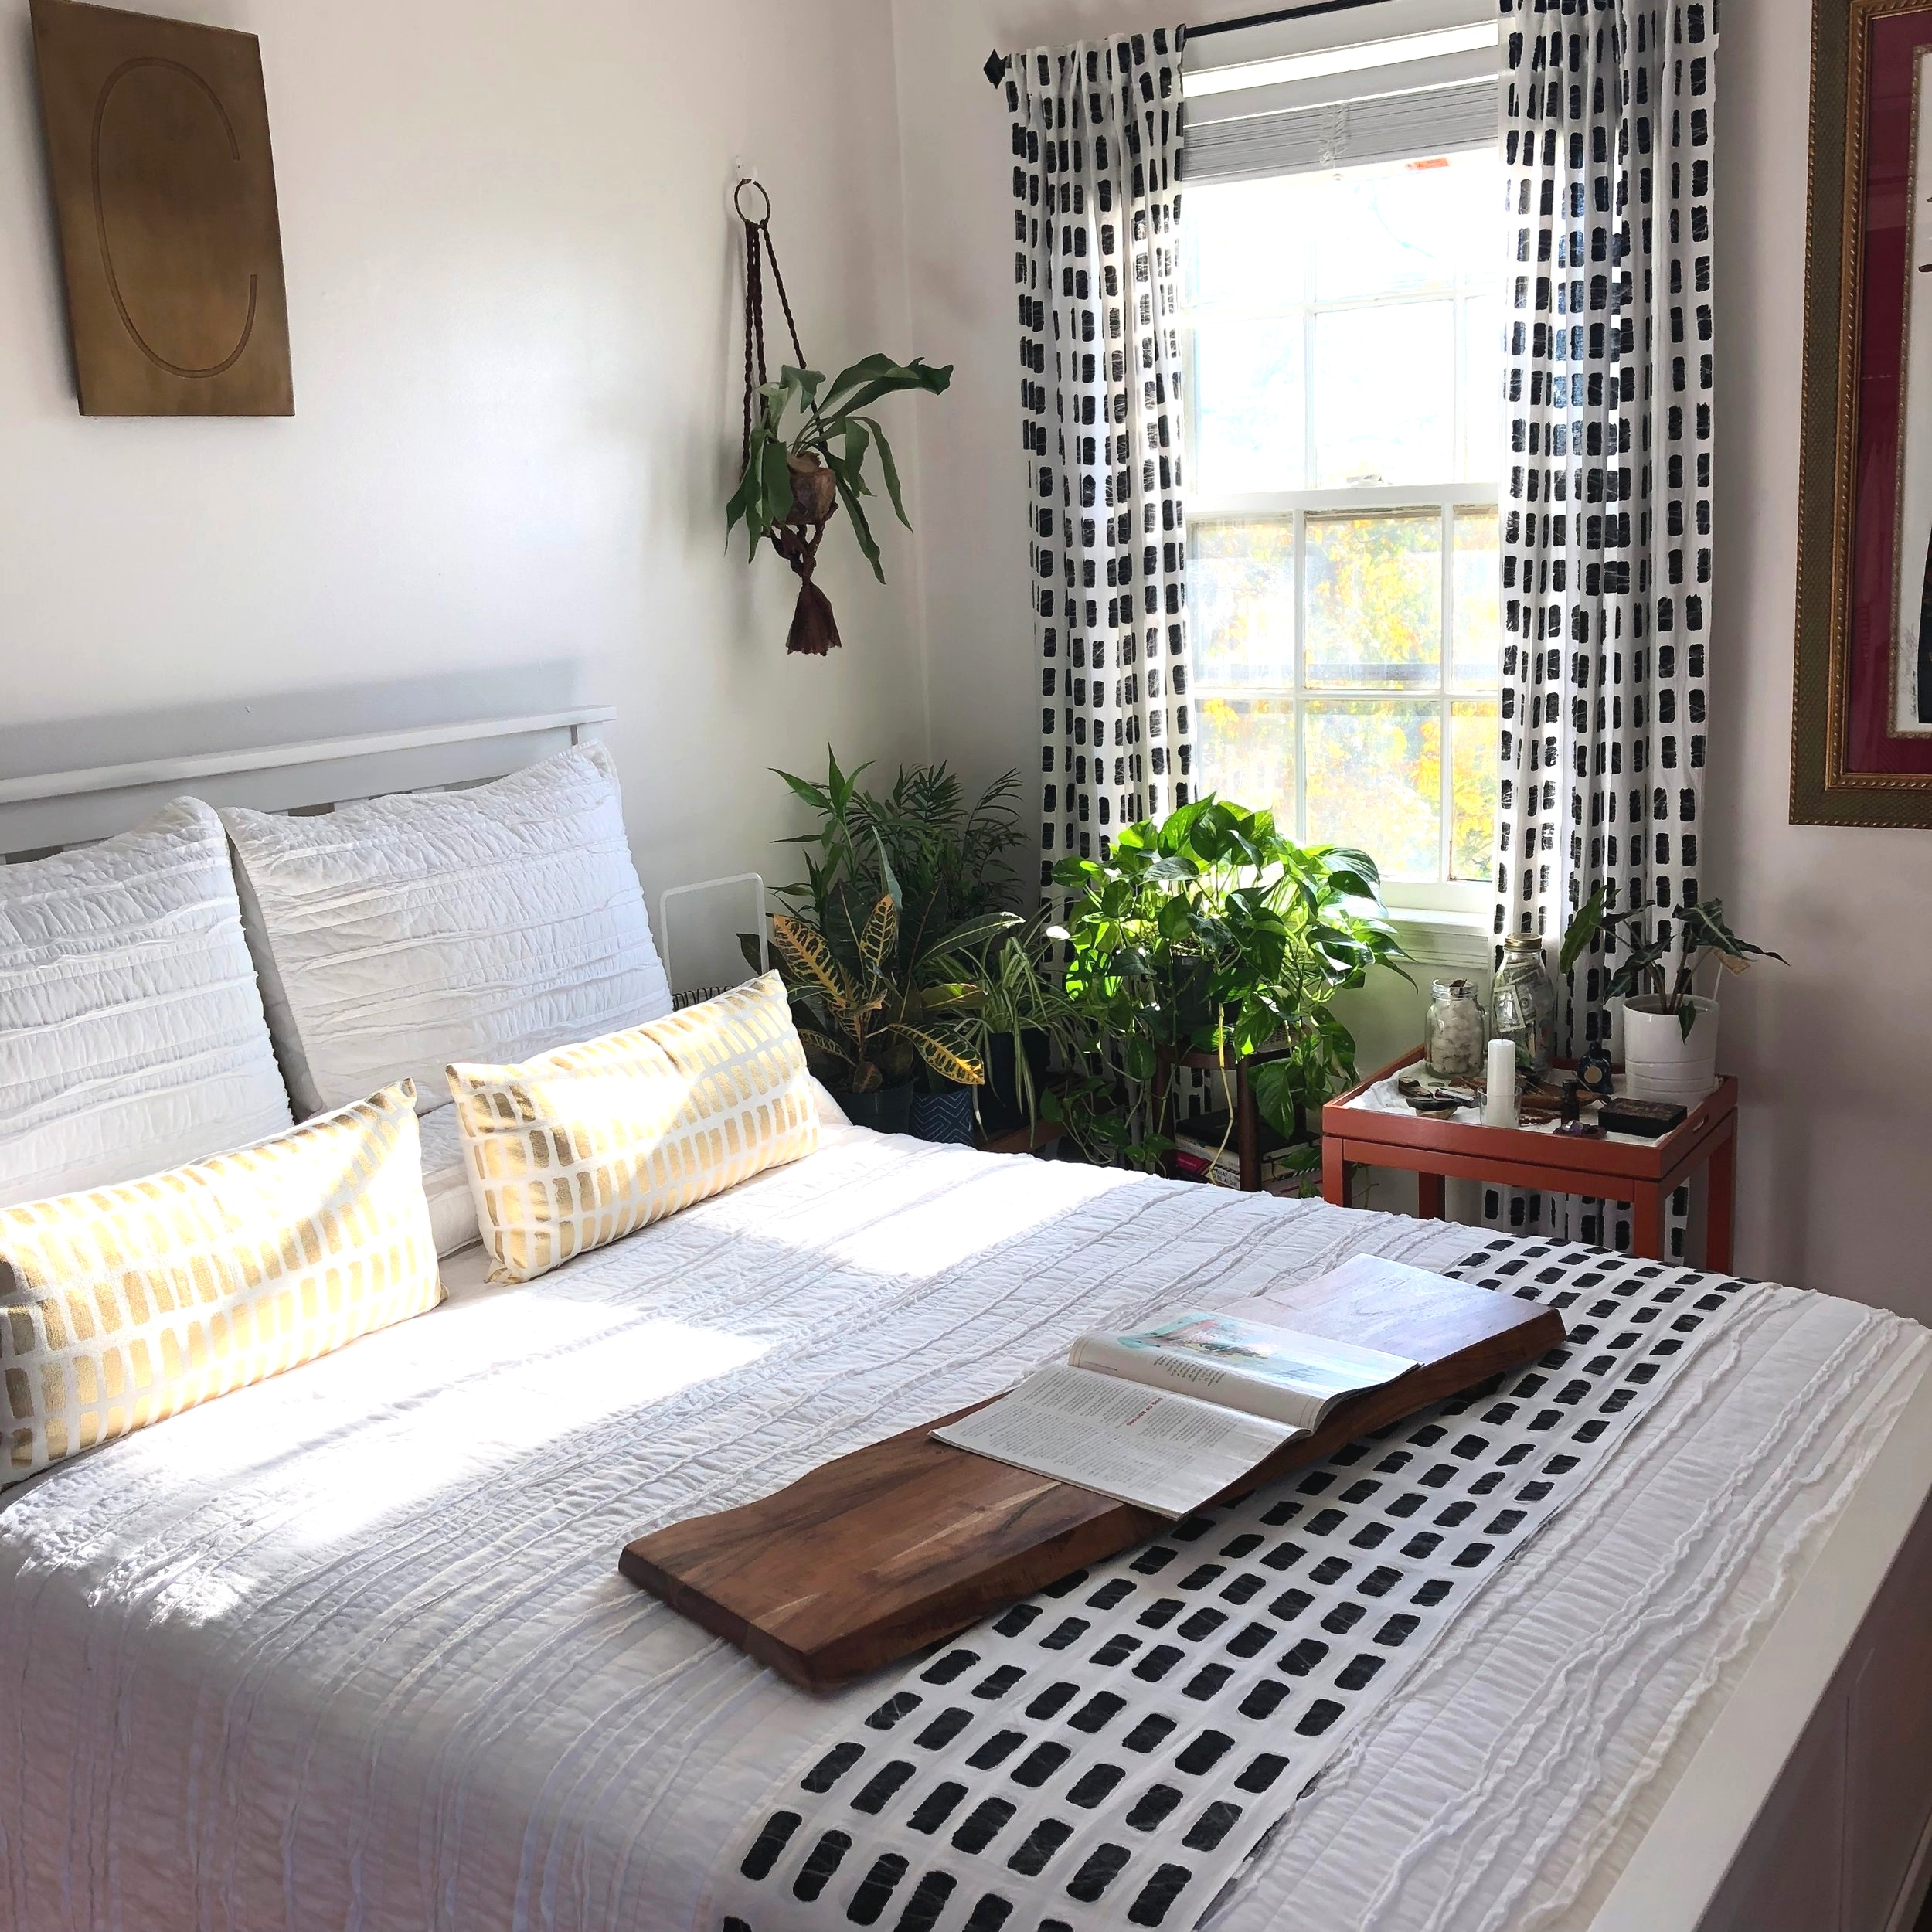 Bedroom_Plants_6.jpg